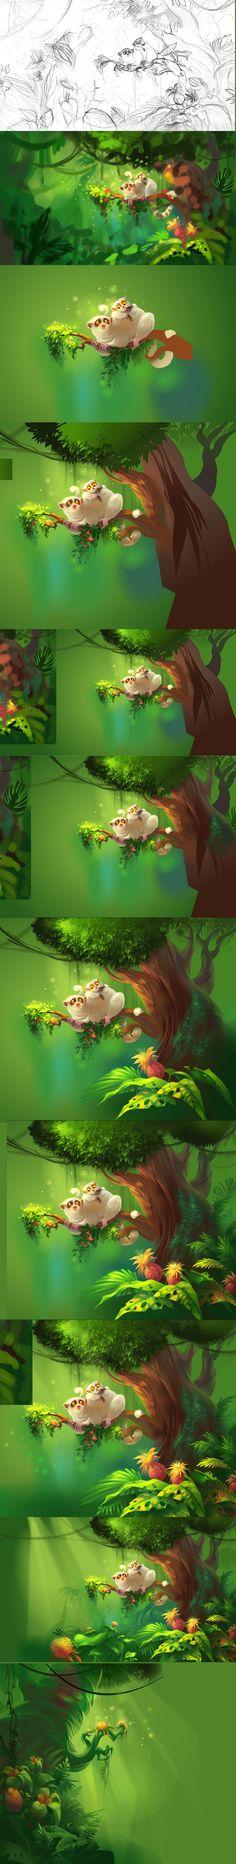 Jungle process by Zzanthia.deviantart.com on @deviantART